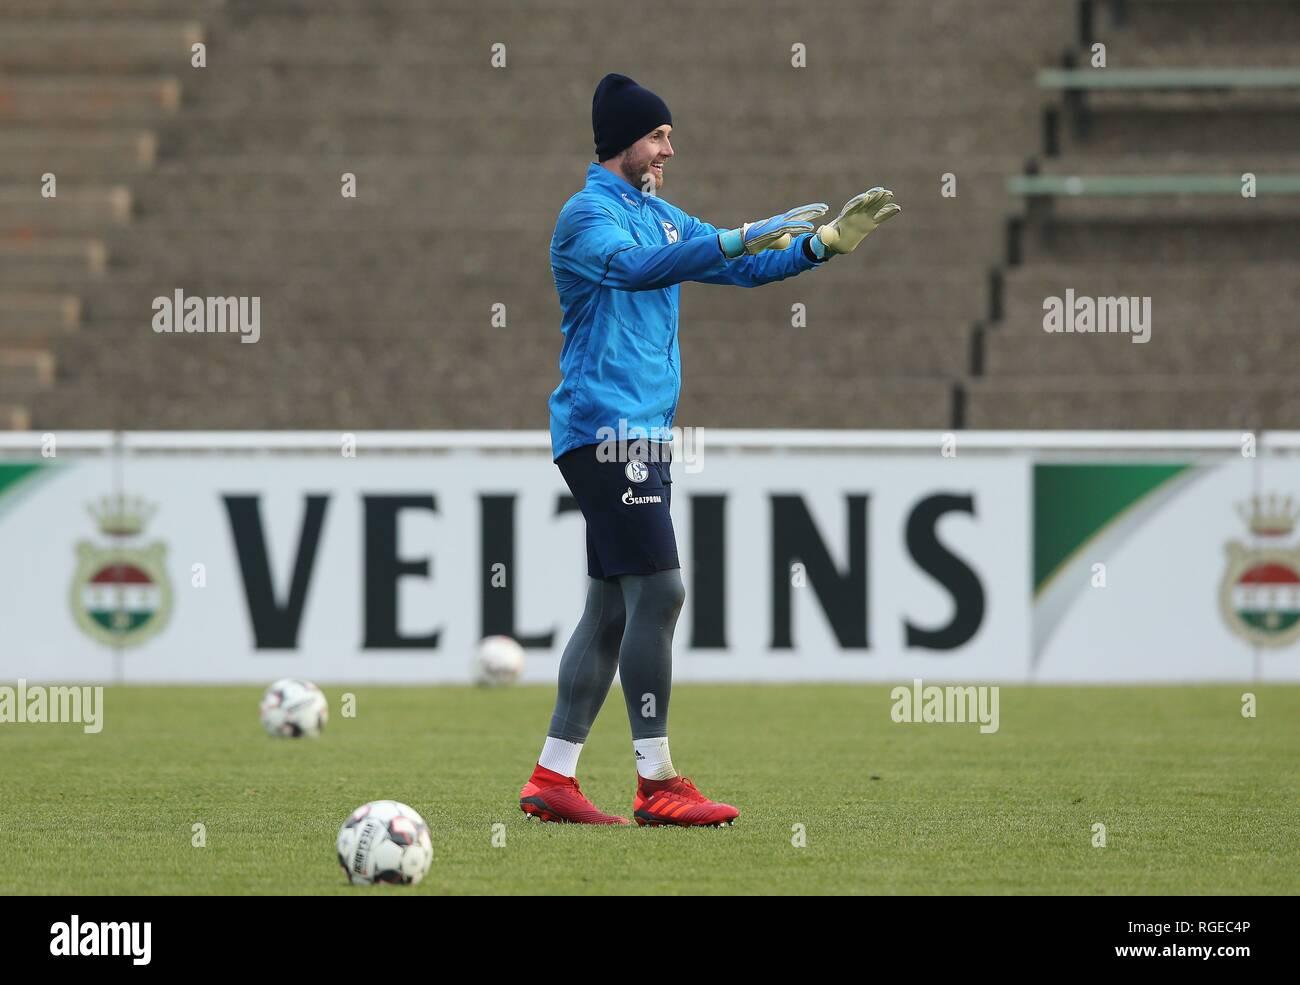 firo: 29.01.2019, football, 1.Bundesliga, season 2018/2019, FC Schalke 04, training, goalkeeper Ralf FAHRMANN, laughs   usage worldwide - Stock Image